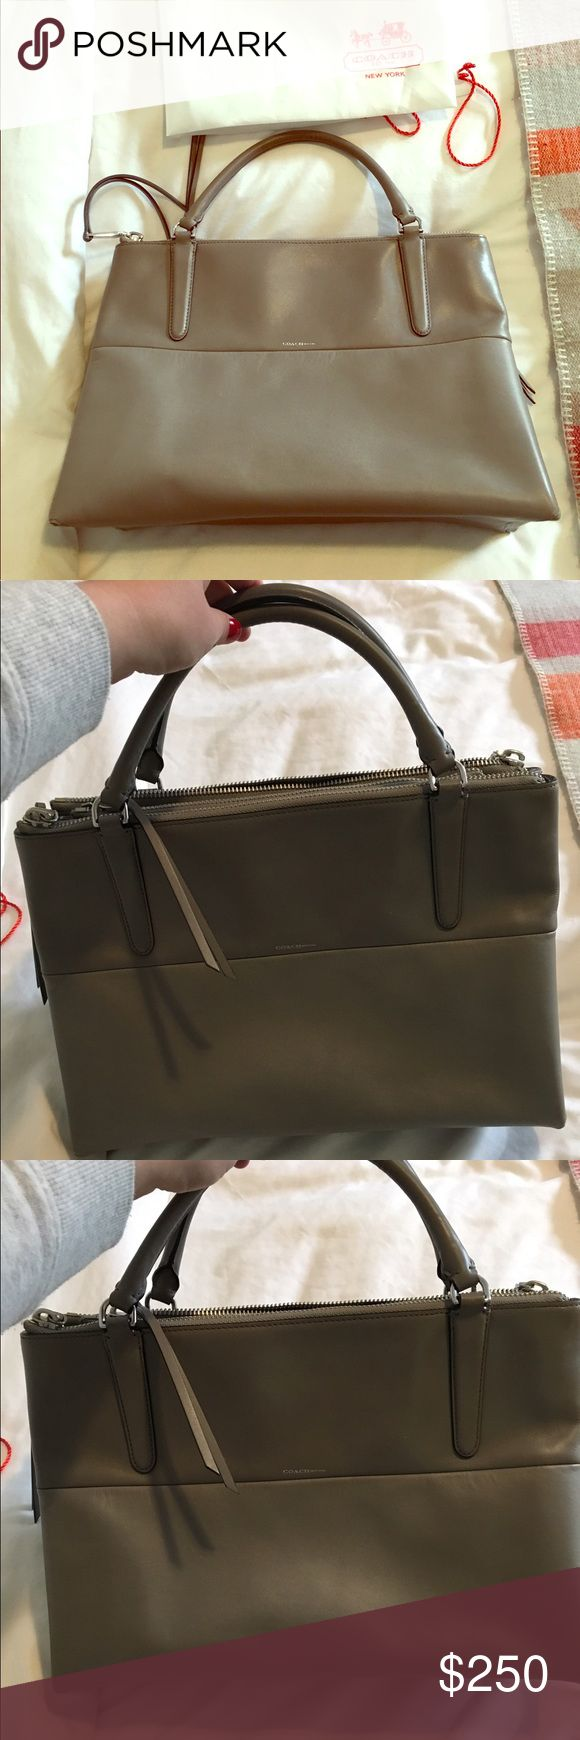 Coach Satchel Bag Great condition!  Beautiful grey color! Coach Bags Satchels